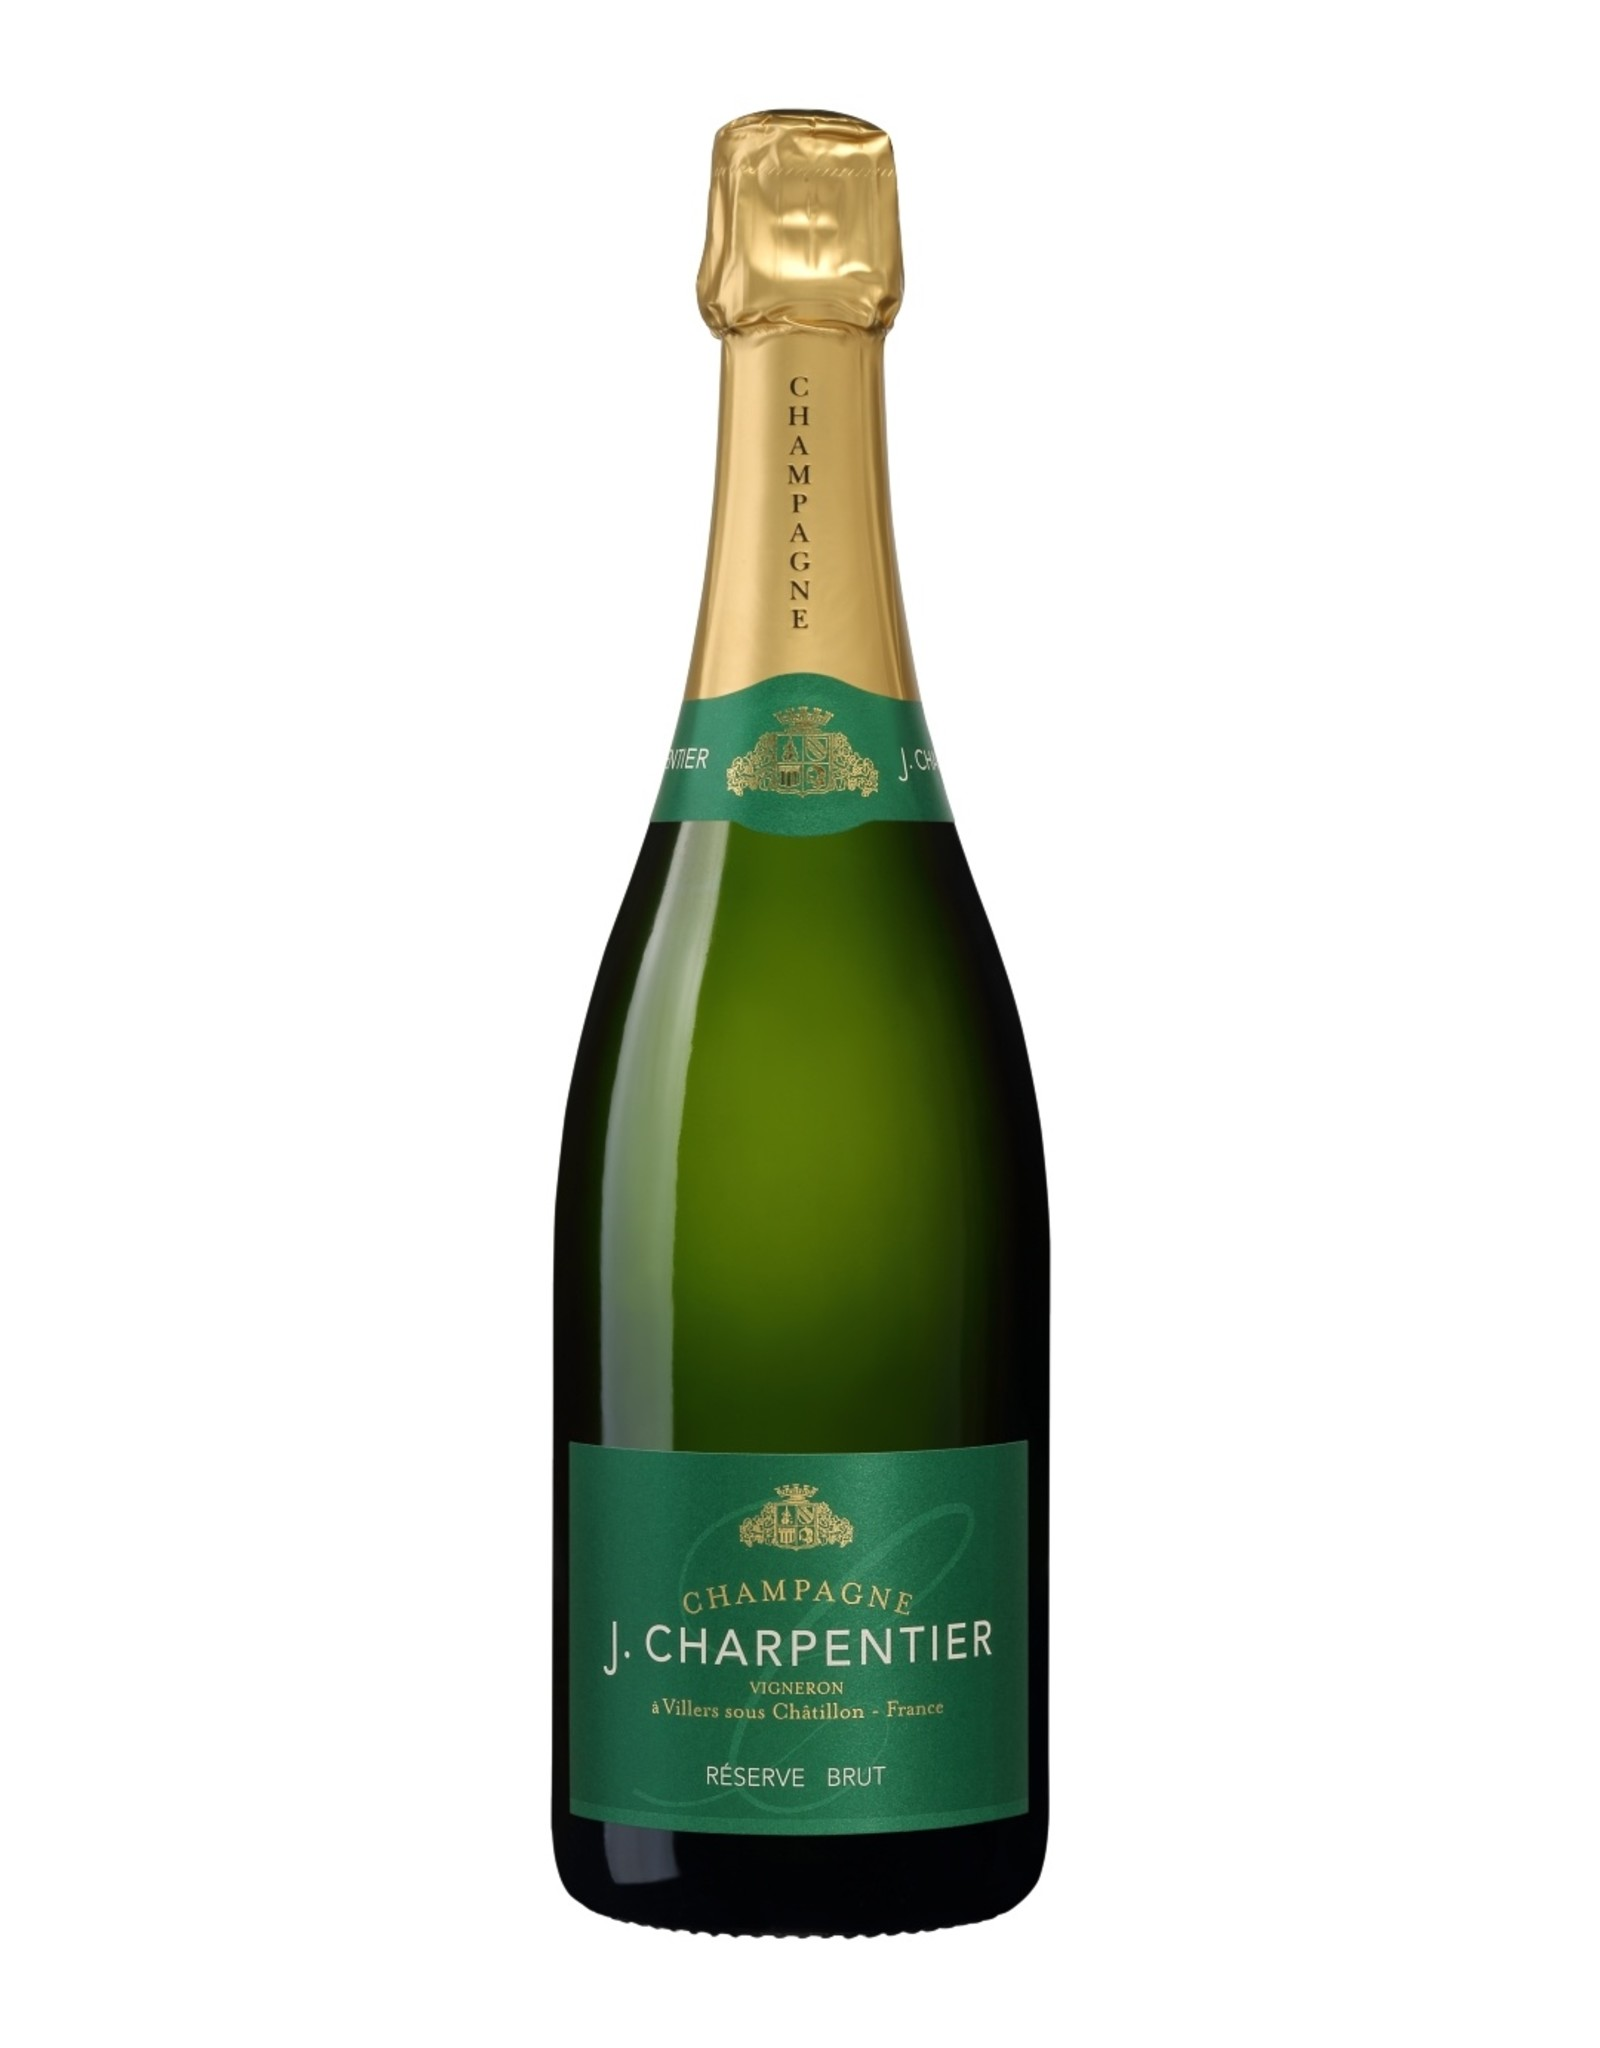 J. Charpentier Champagne J. Charpentier Reserve Brut - 0,375l